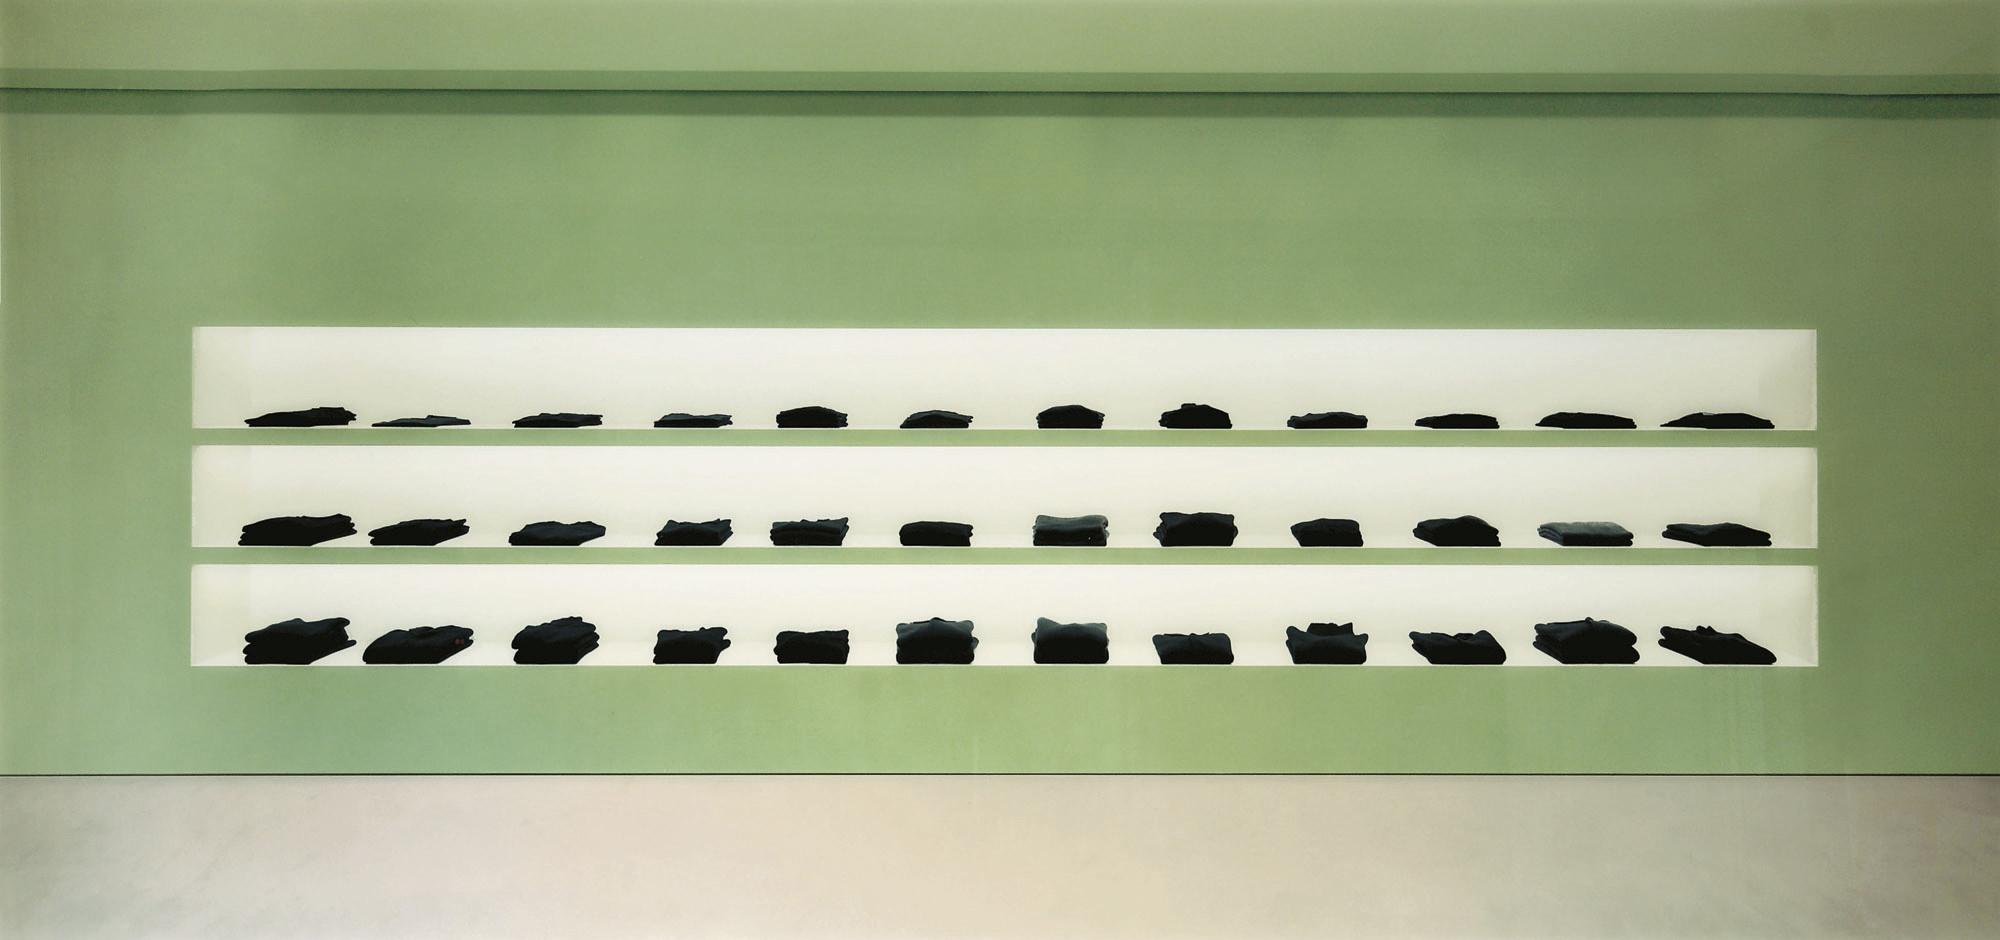 Andreas Gursky (b. 1955)